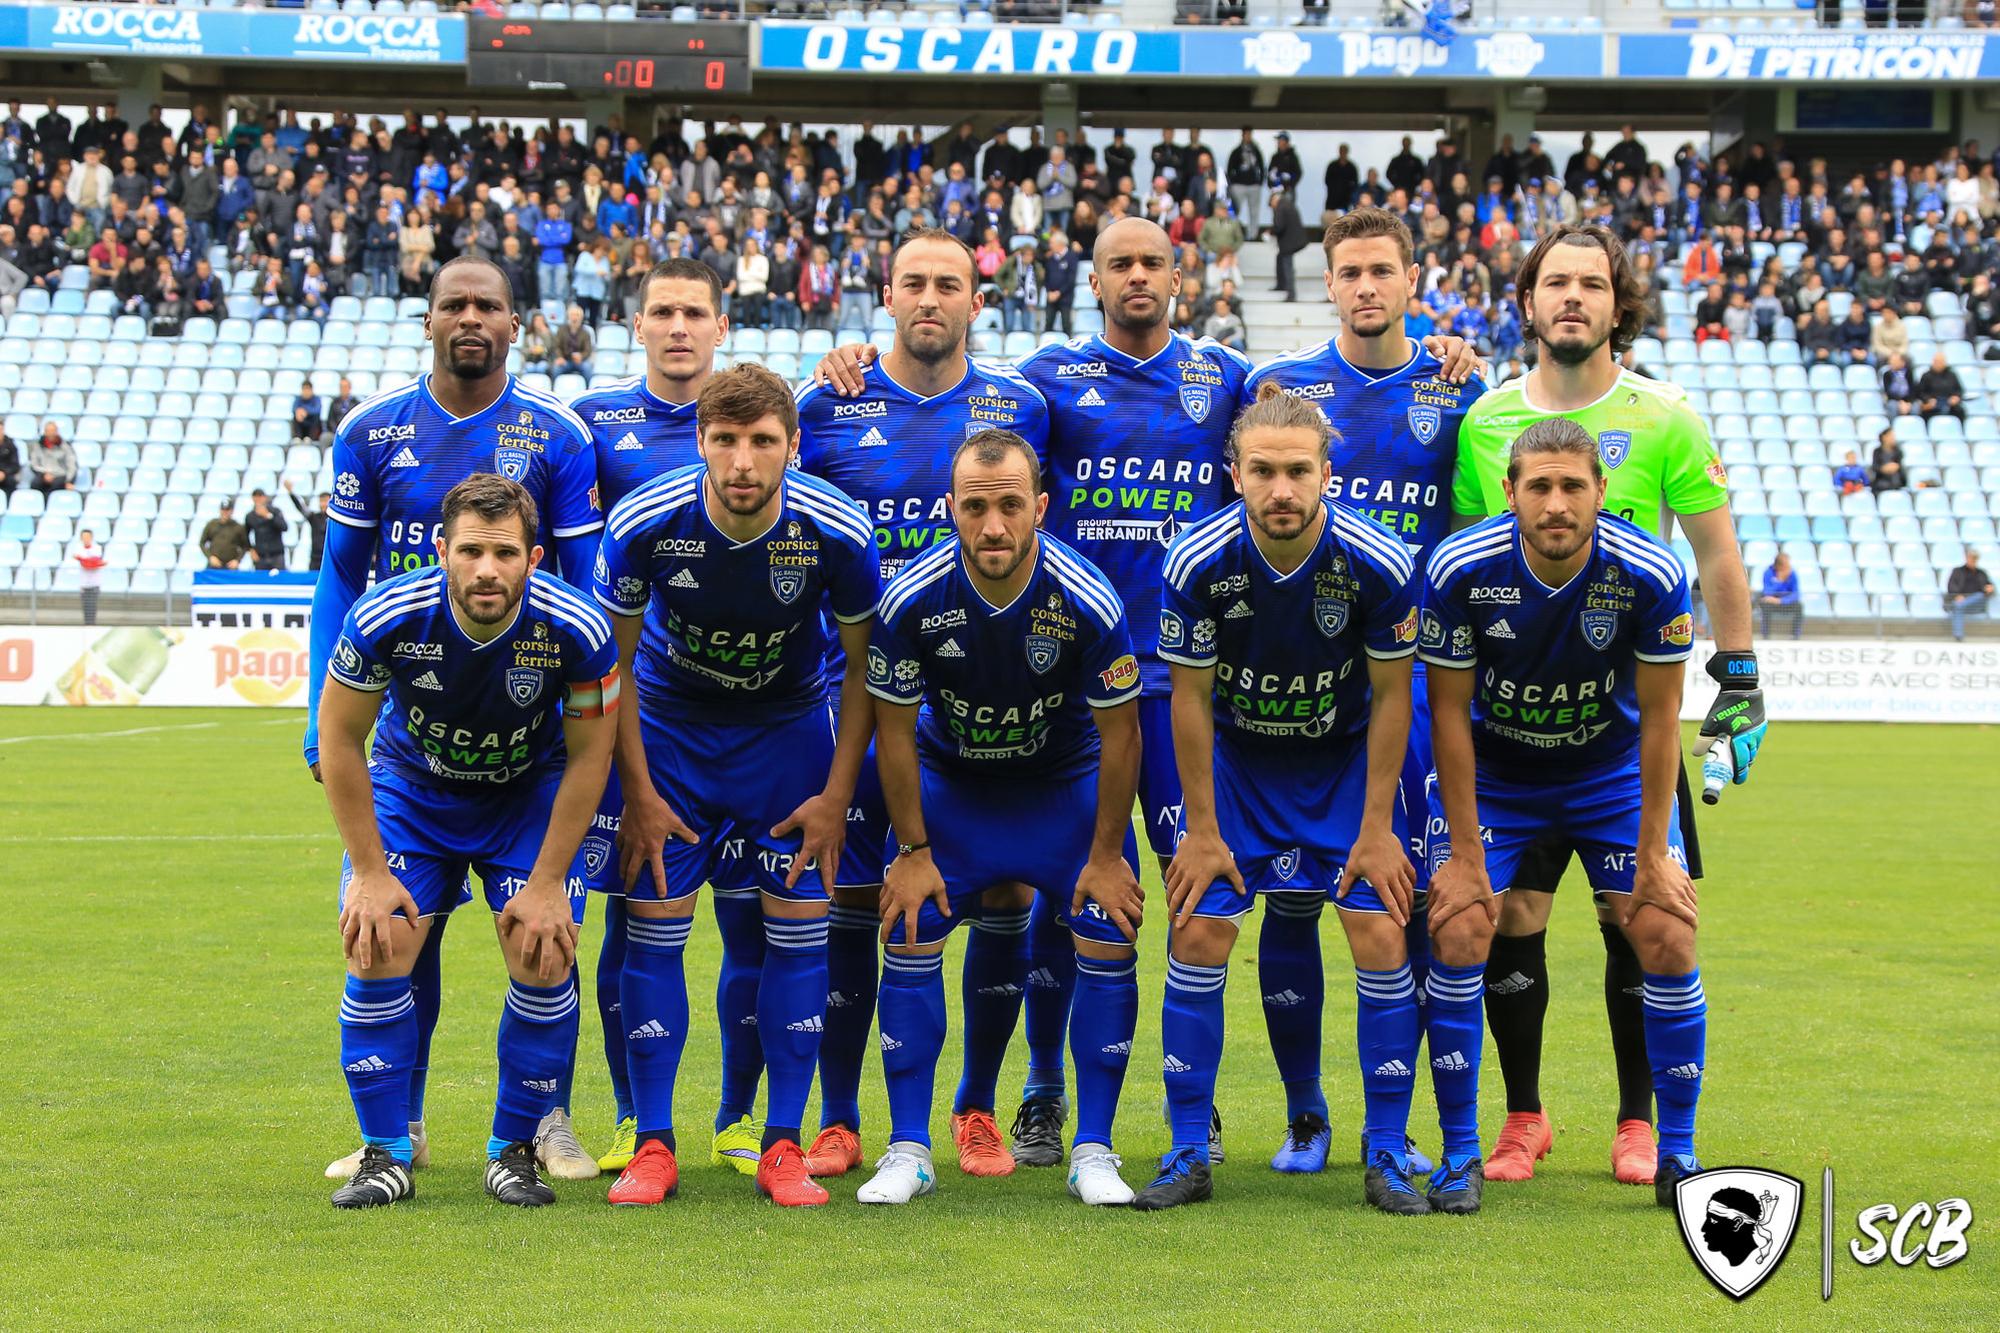 SCB 3-0 IFC (18/05/2019)